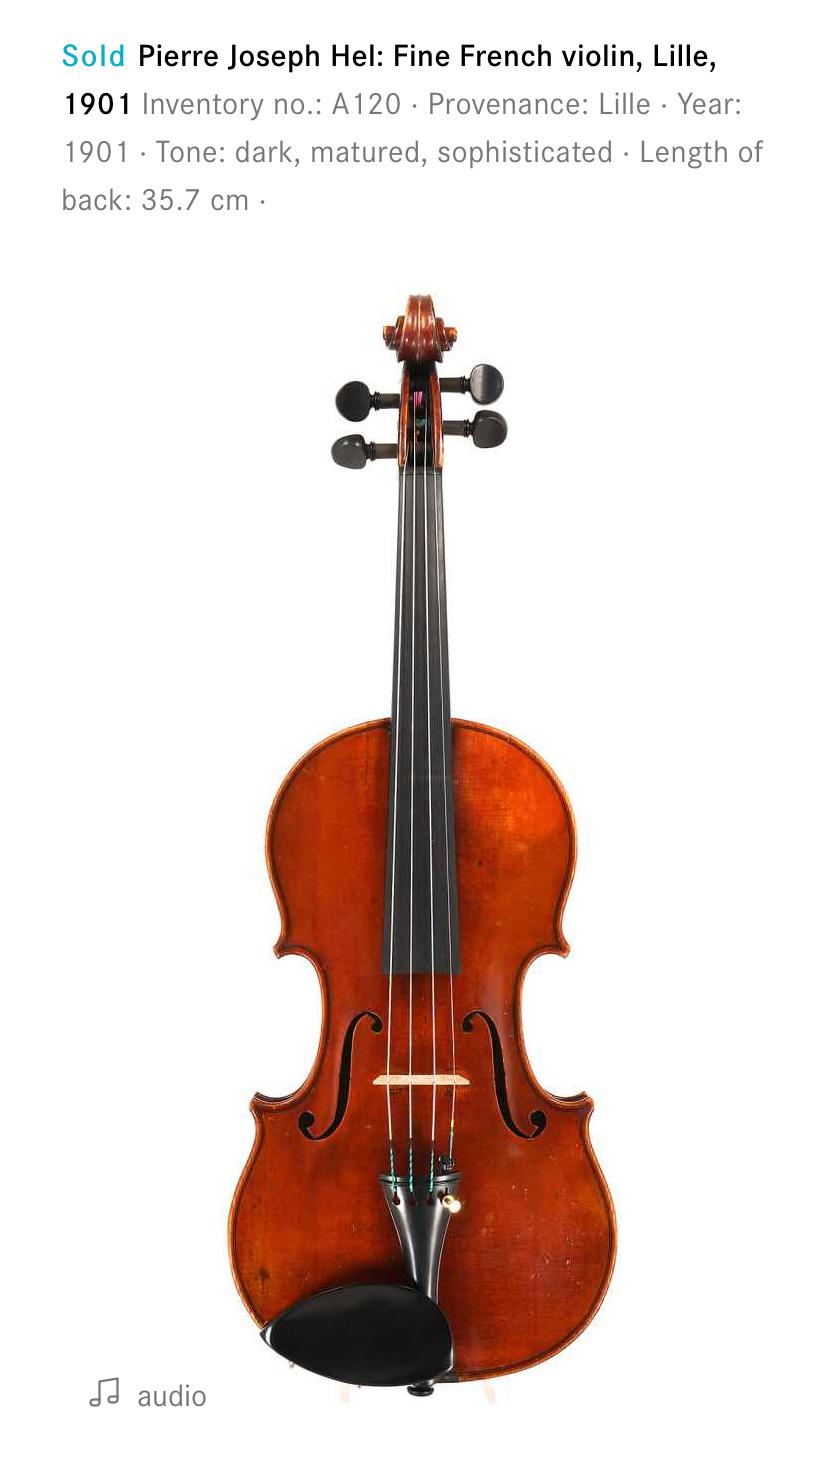 Pierre Joseph Hel violin